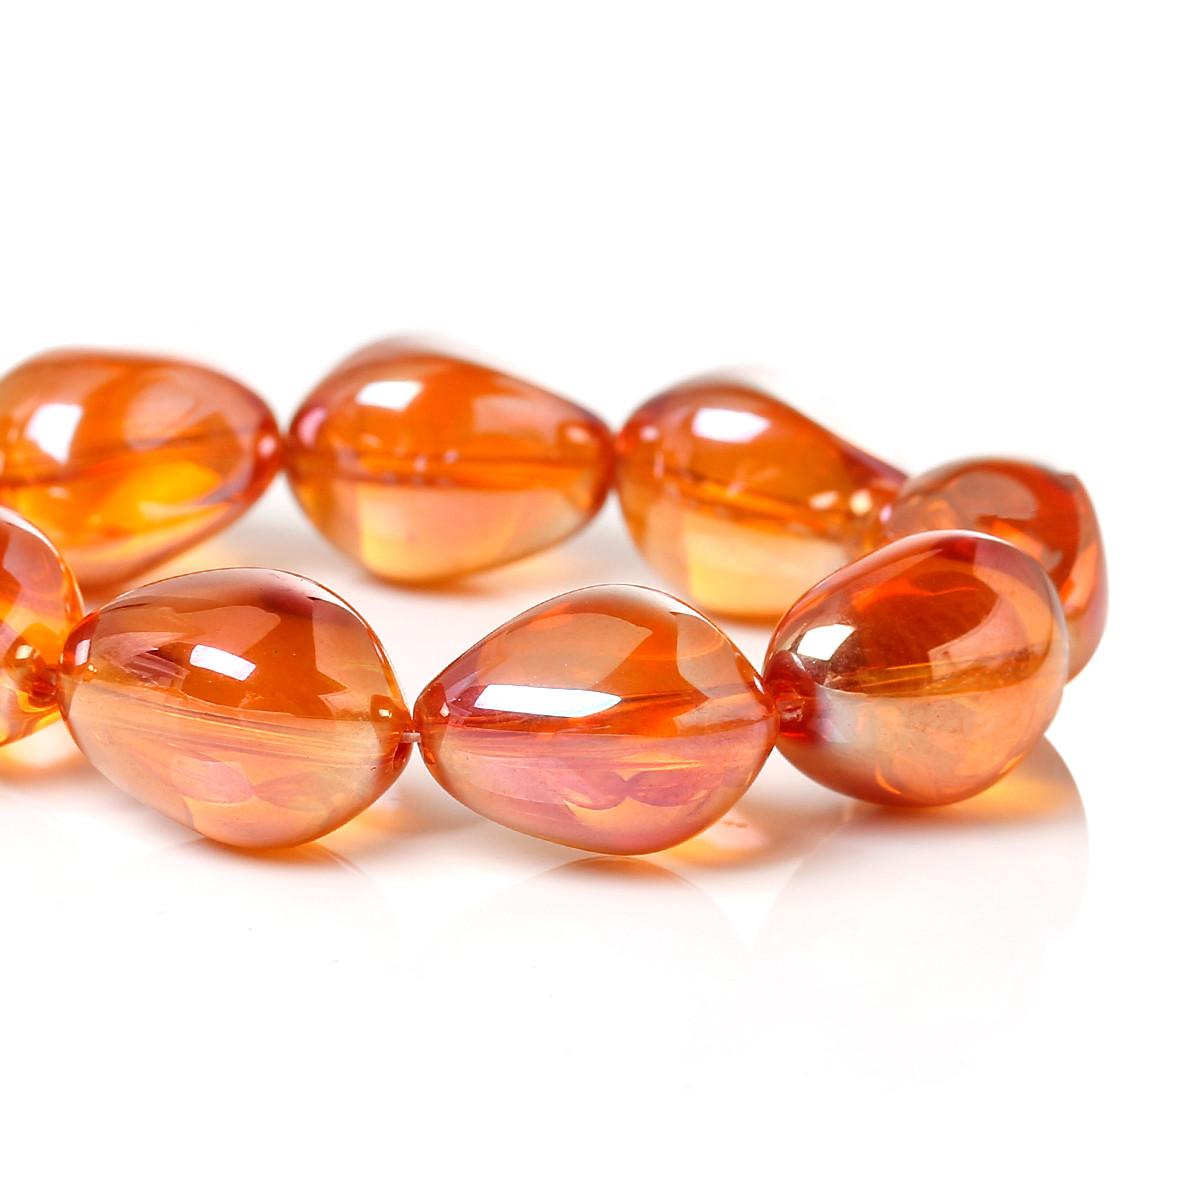 Стеклянная Бусина, Капля, Оранжевая, Шлифованная, 17.0 мм x 14.0 мм, 1.3 мм